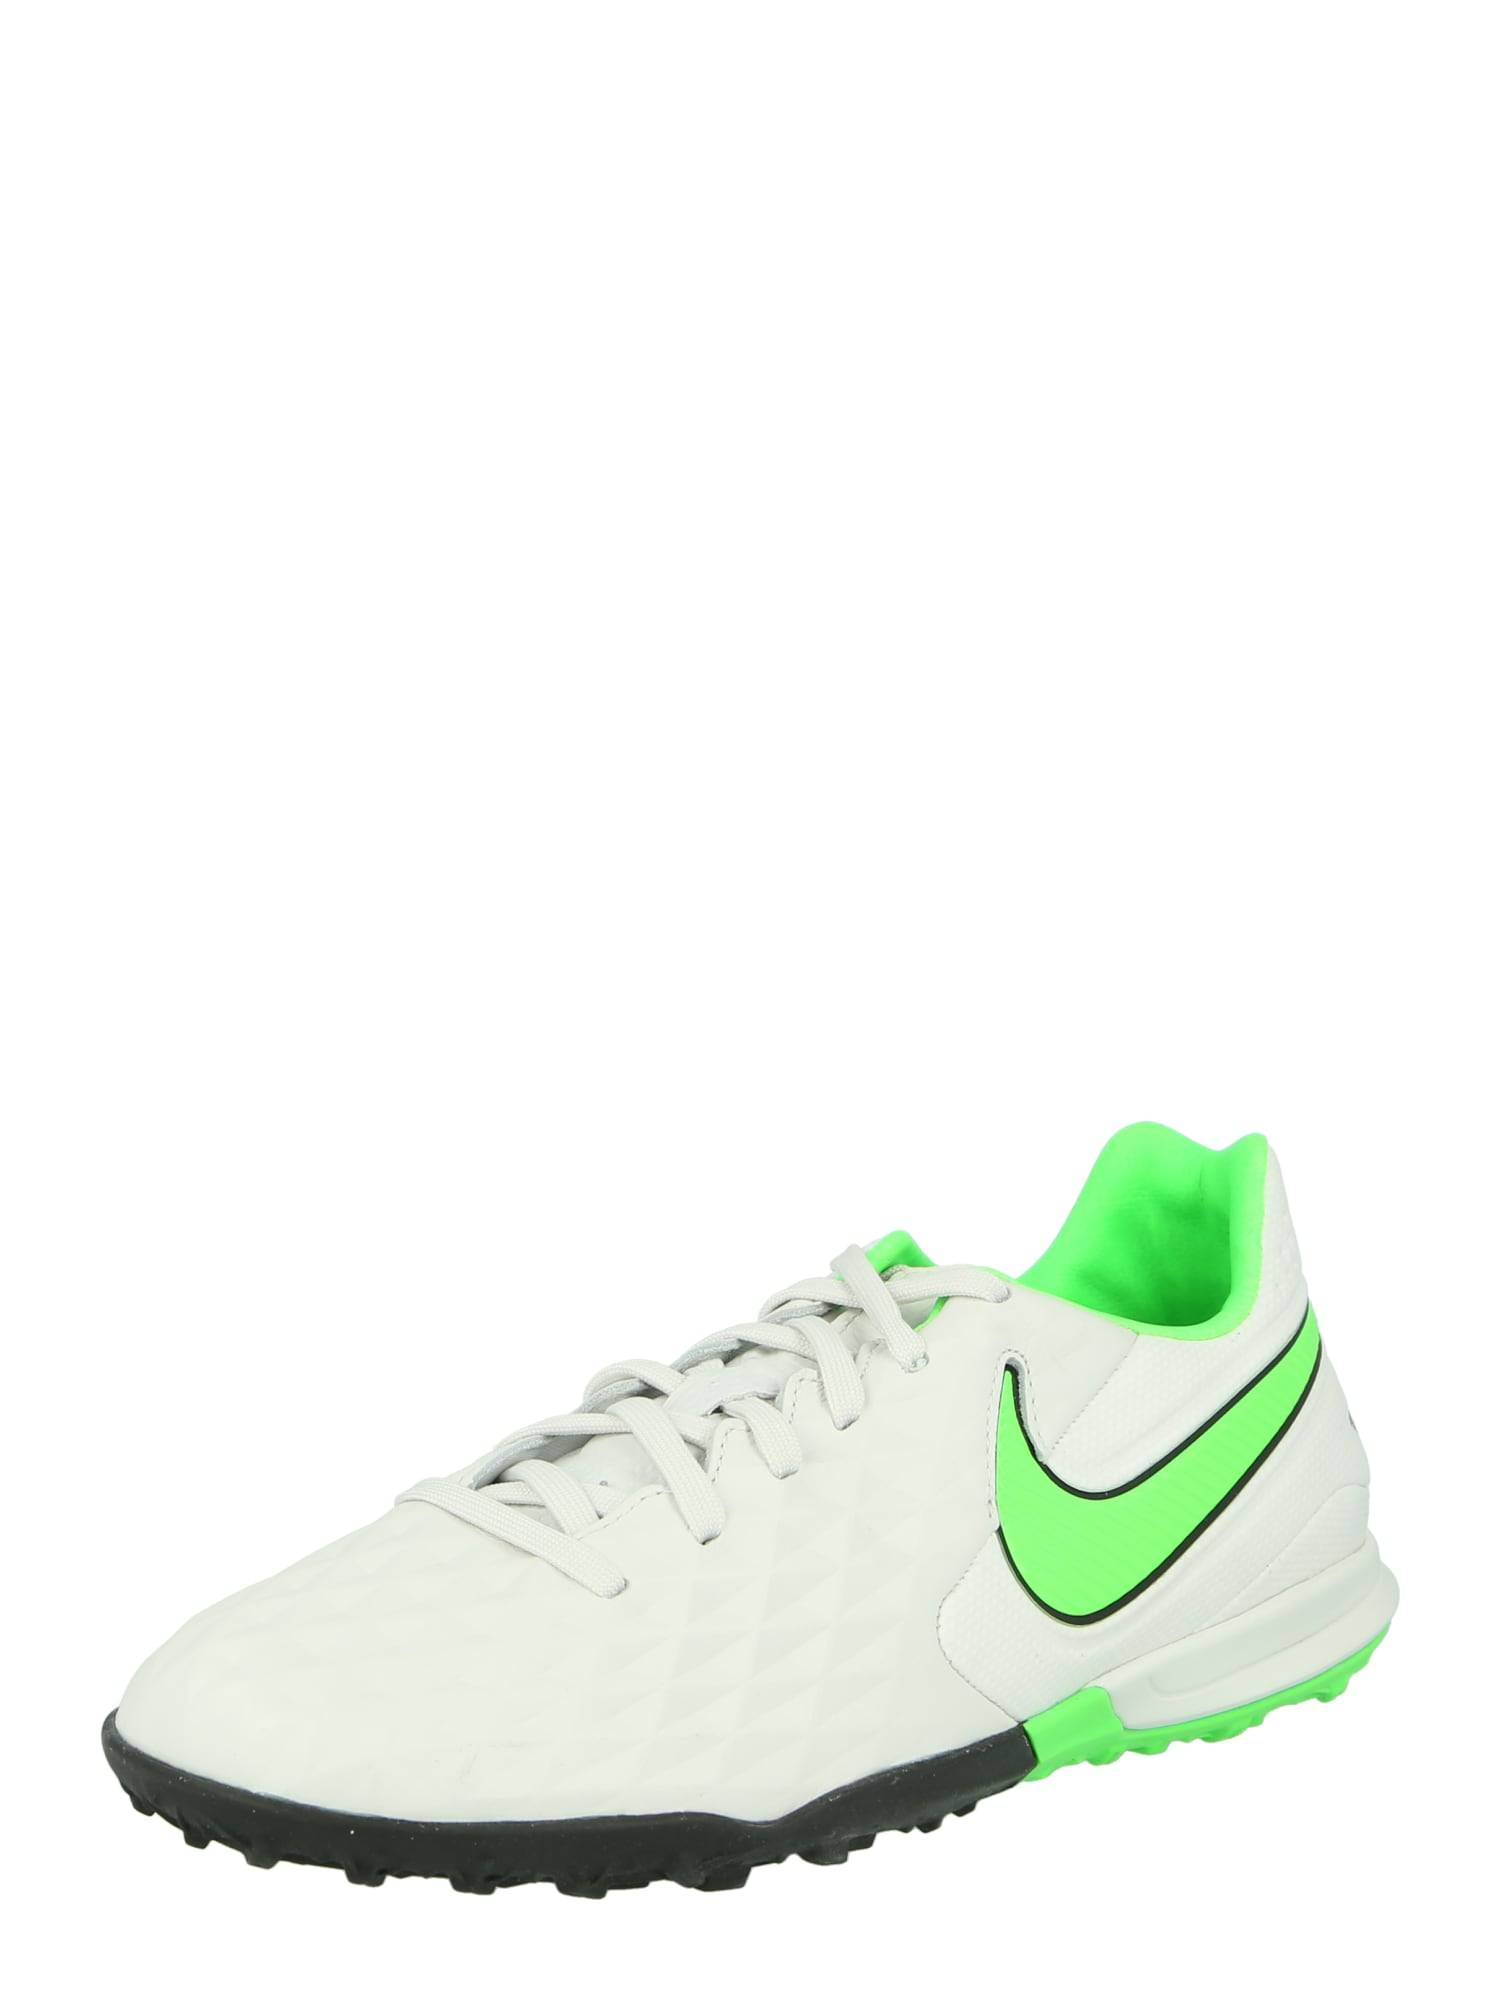 NIKE Chaussure de foot 'Tiempo Legend 8 Pro TF'  - Blanc - Taille: 7 - male